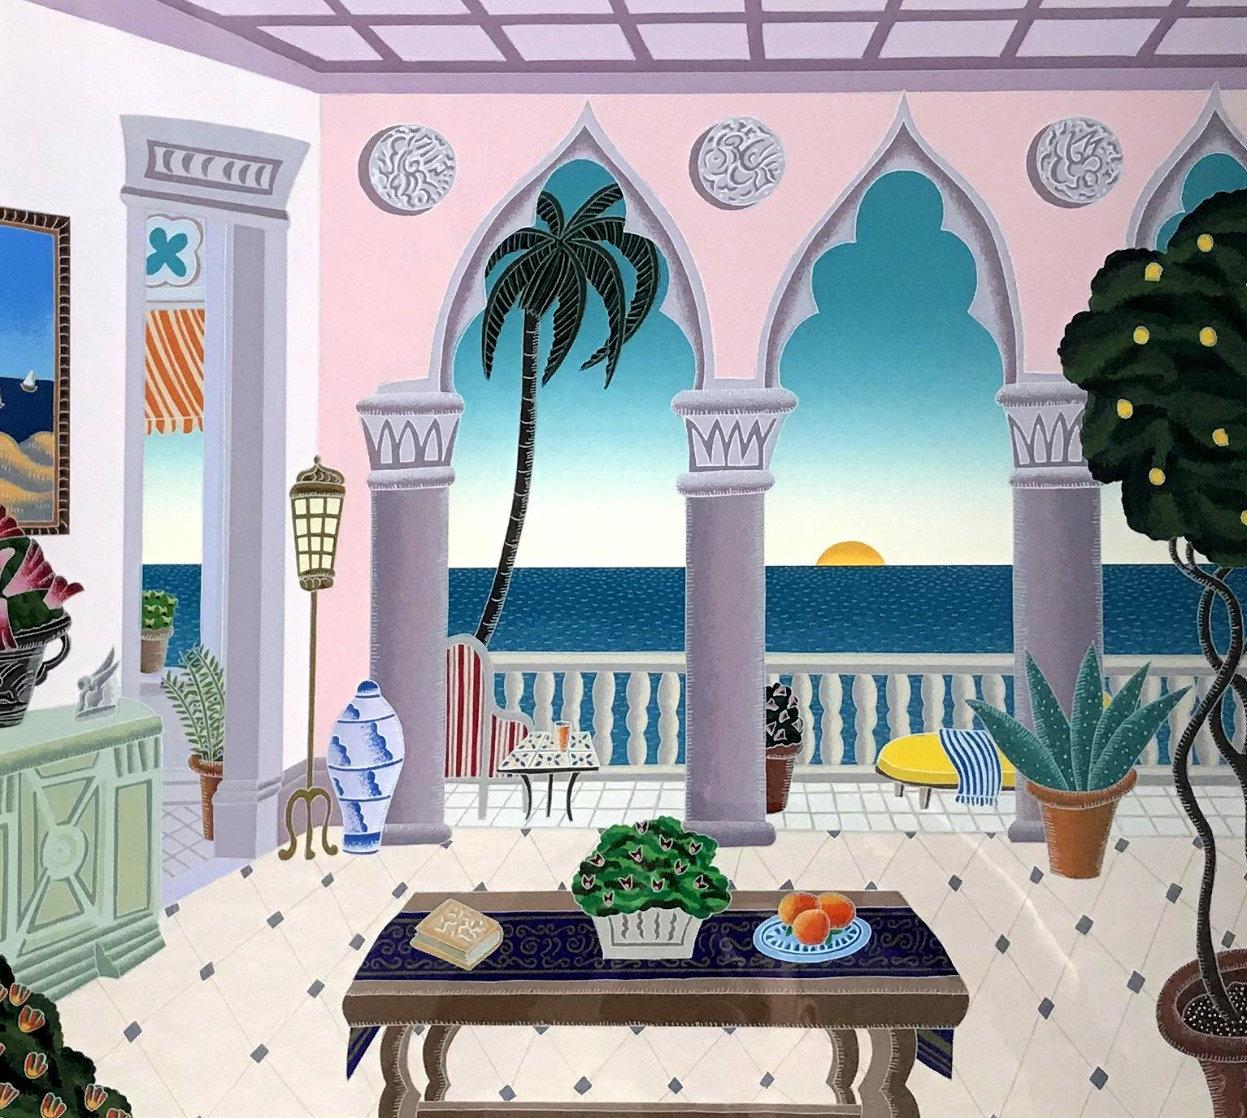 Palm Beach Suite 2 - Villa Laguna - 1991 Limited Edition Print by Thomas Frederick McKnight